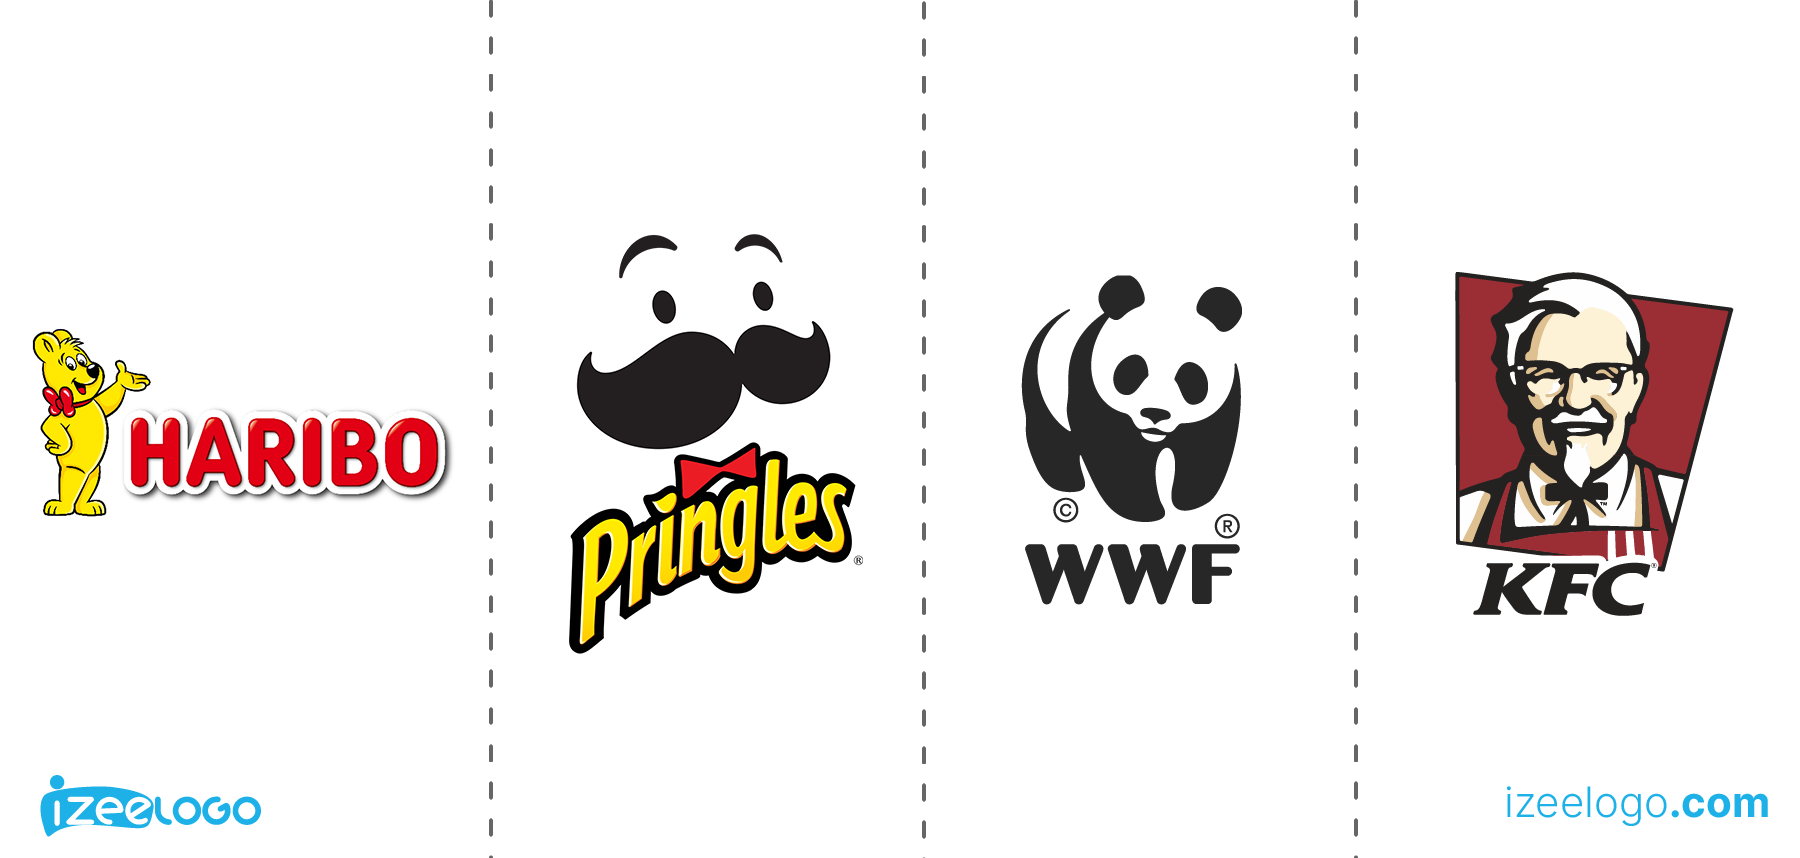 Exemples de logo mascotte : logo Haribo PNG, logo Pringles PNG, logo WWF PNG et logo KFC PNG.